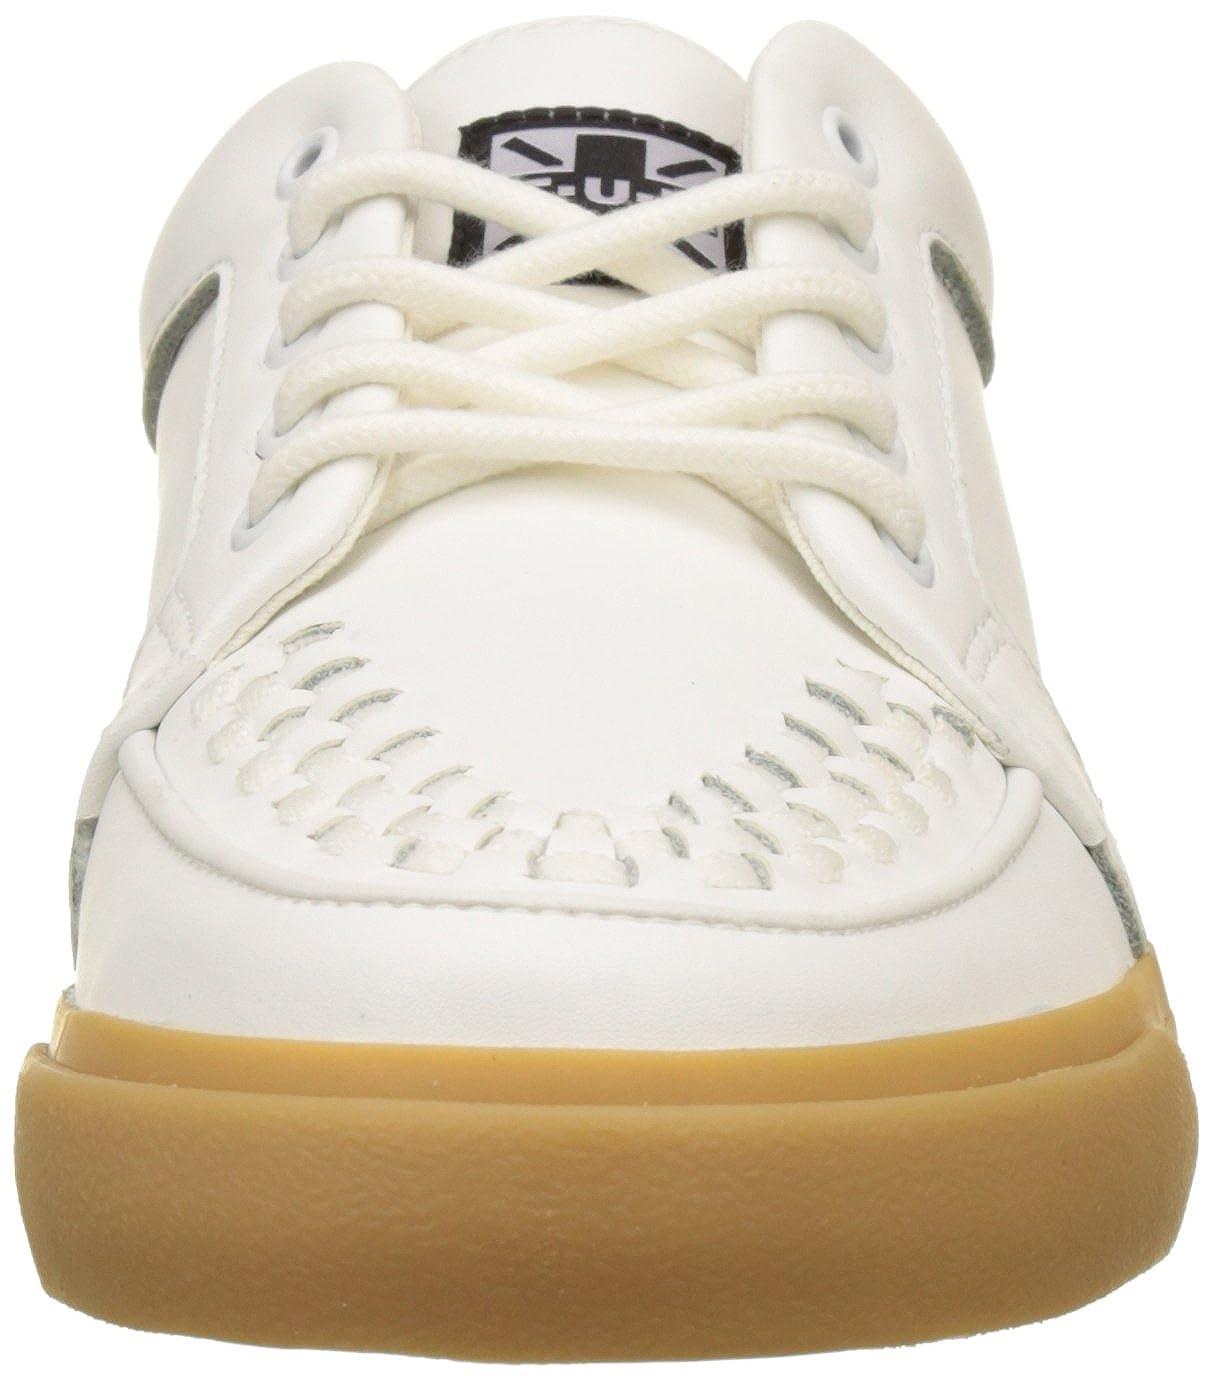 Creeper Basses kVlk SoleBaskets Sneaker Wht u Gum T Mixte Leath 34jqc5ARLS